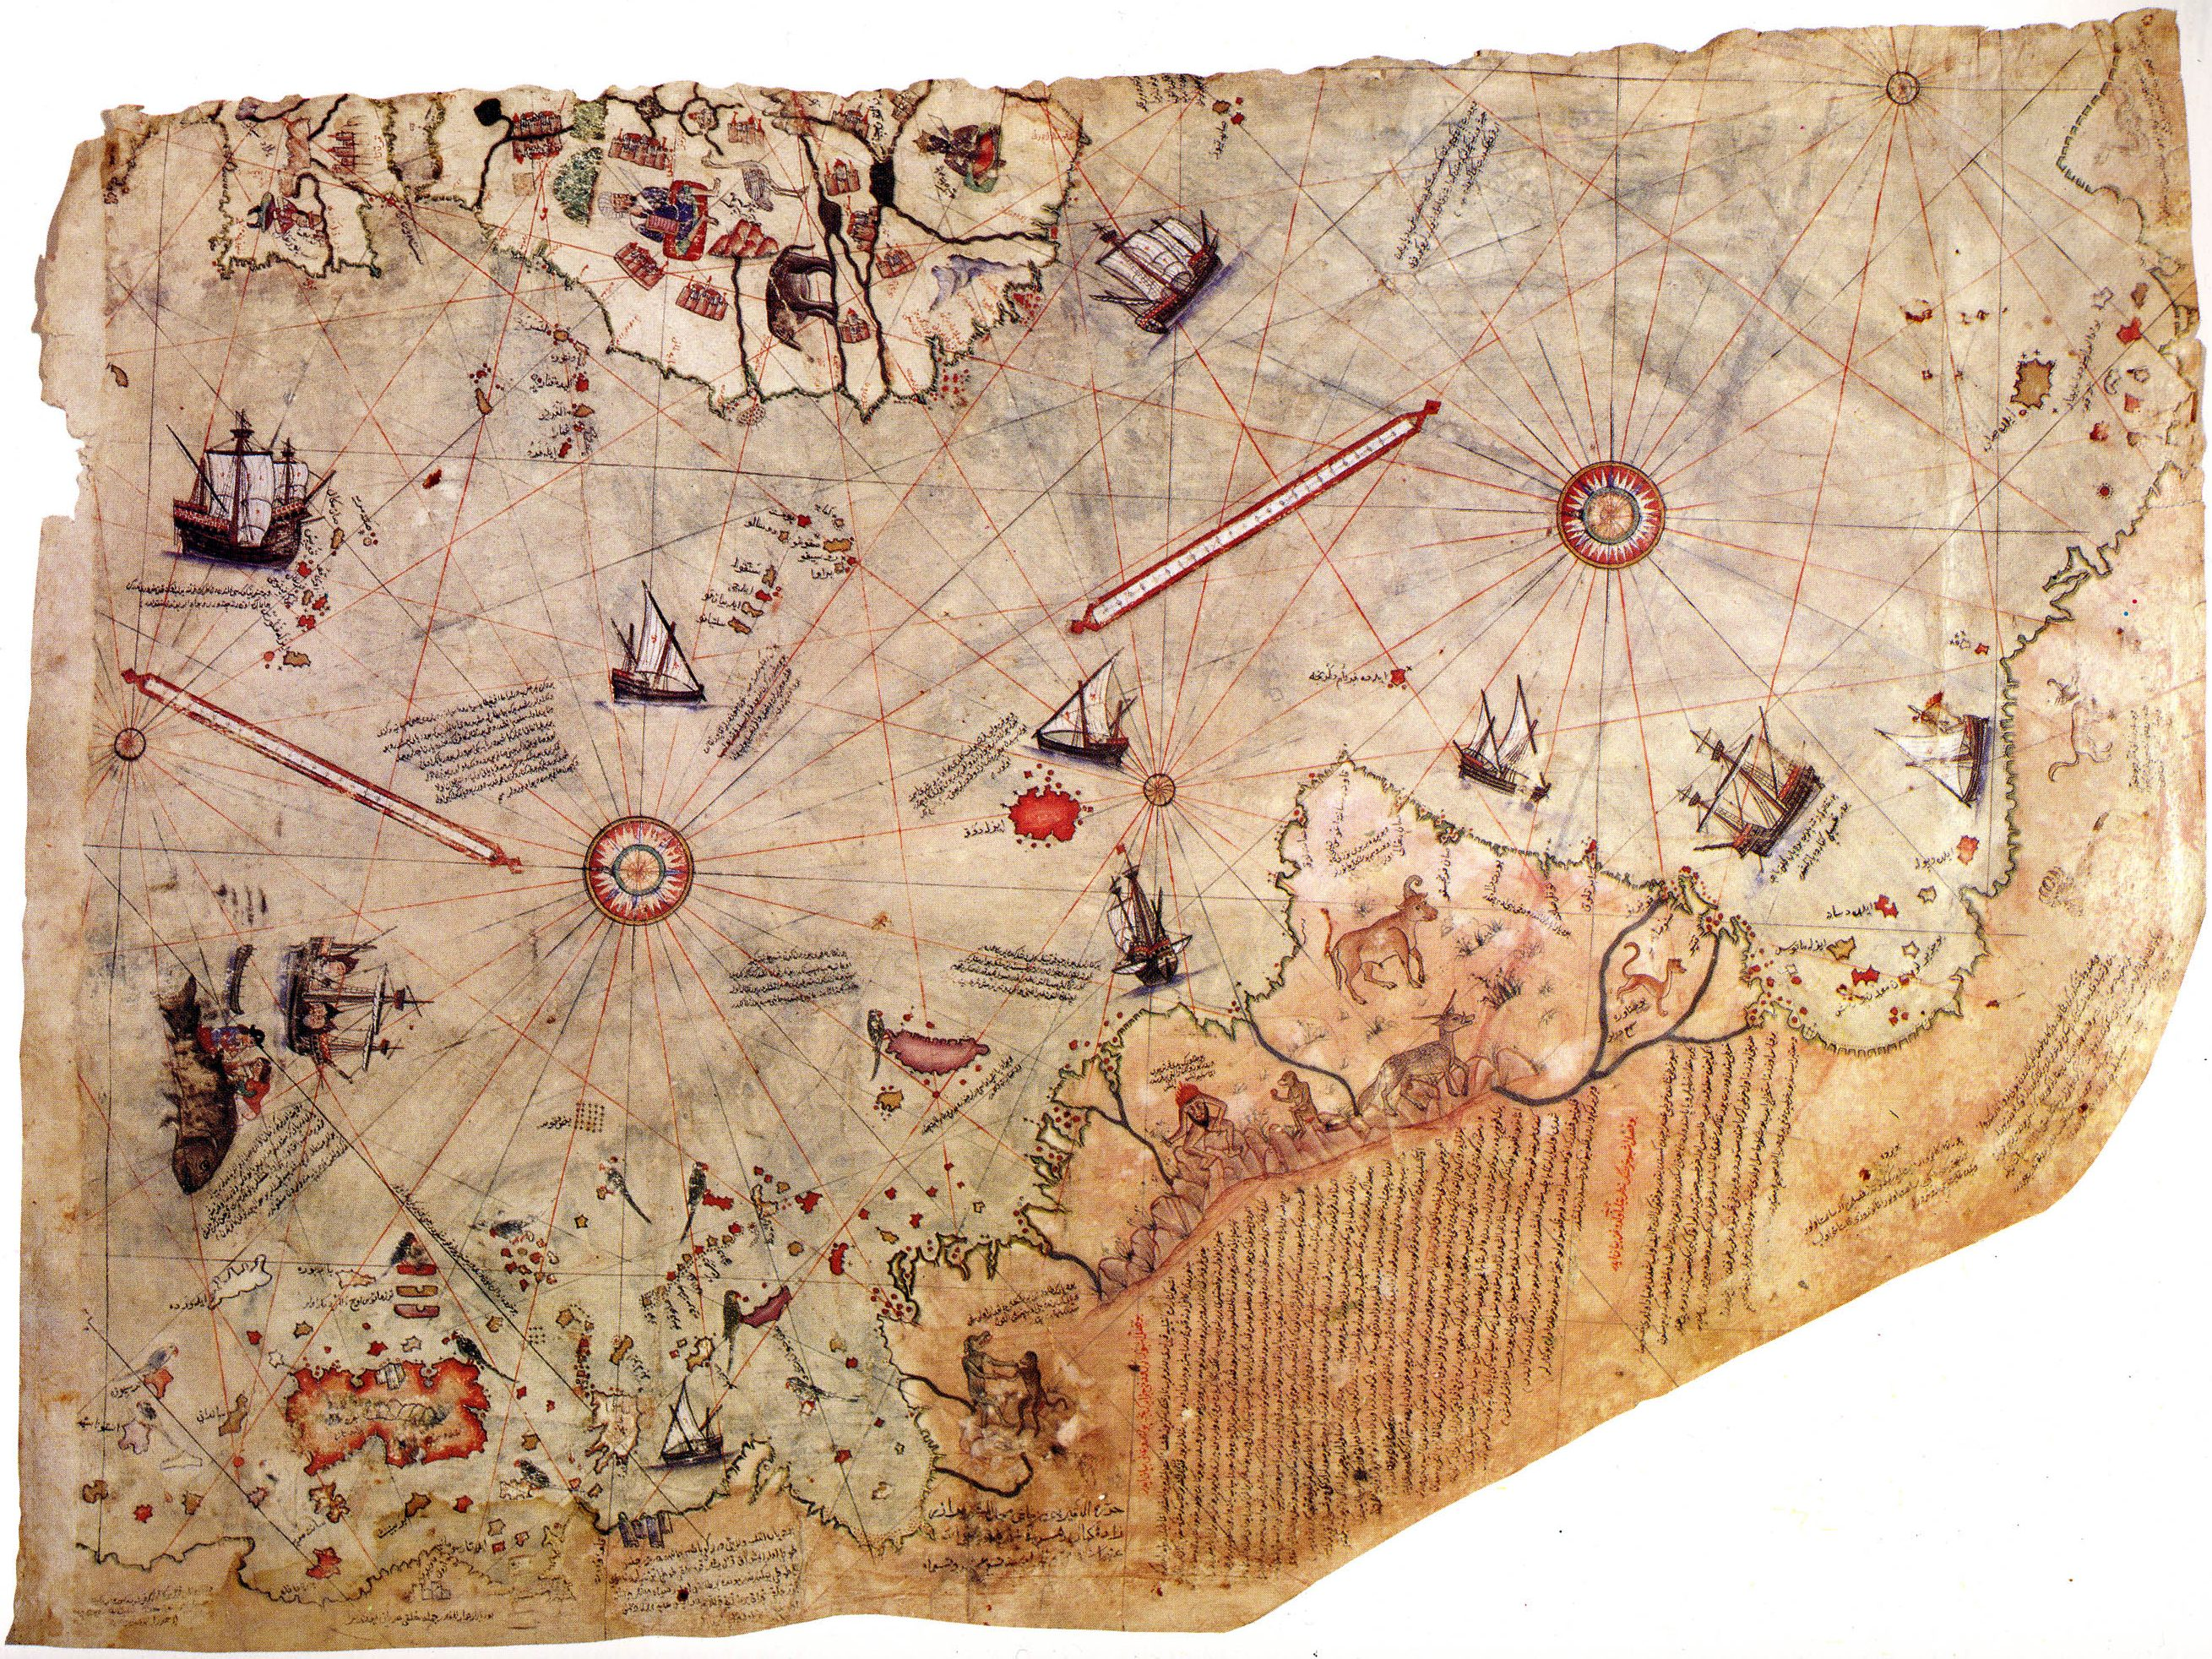 Piri Reis Karte